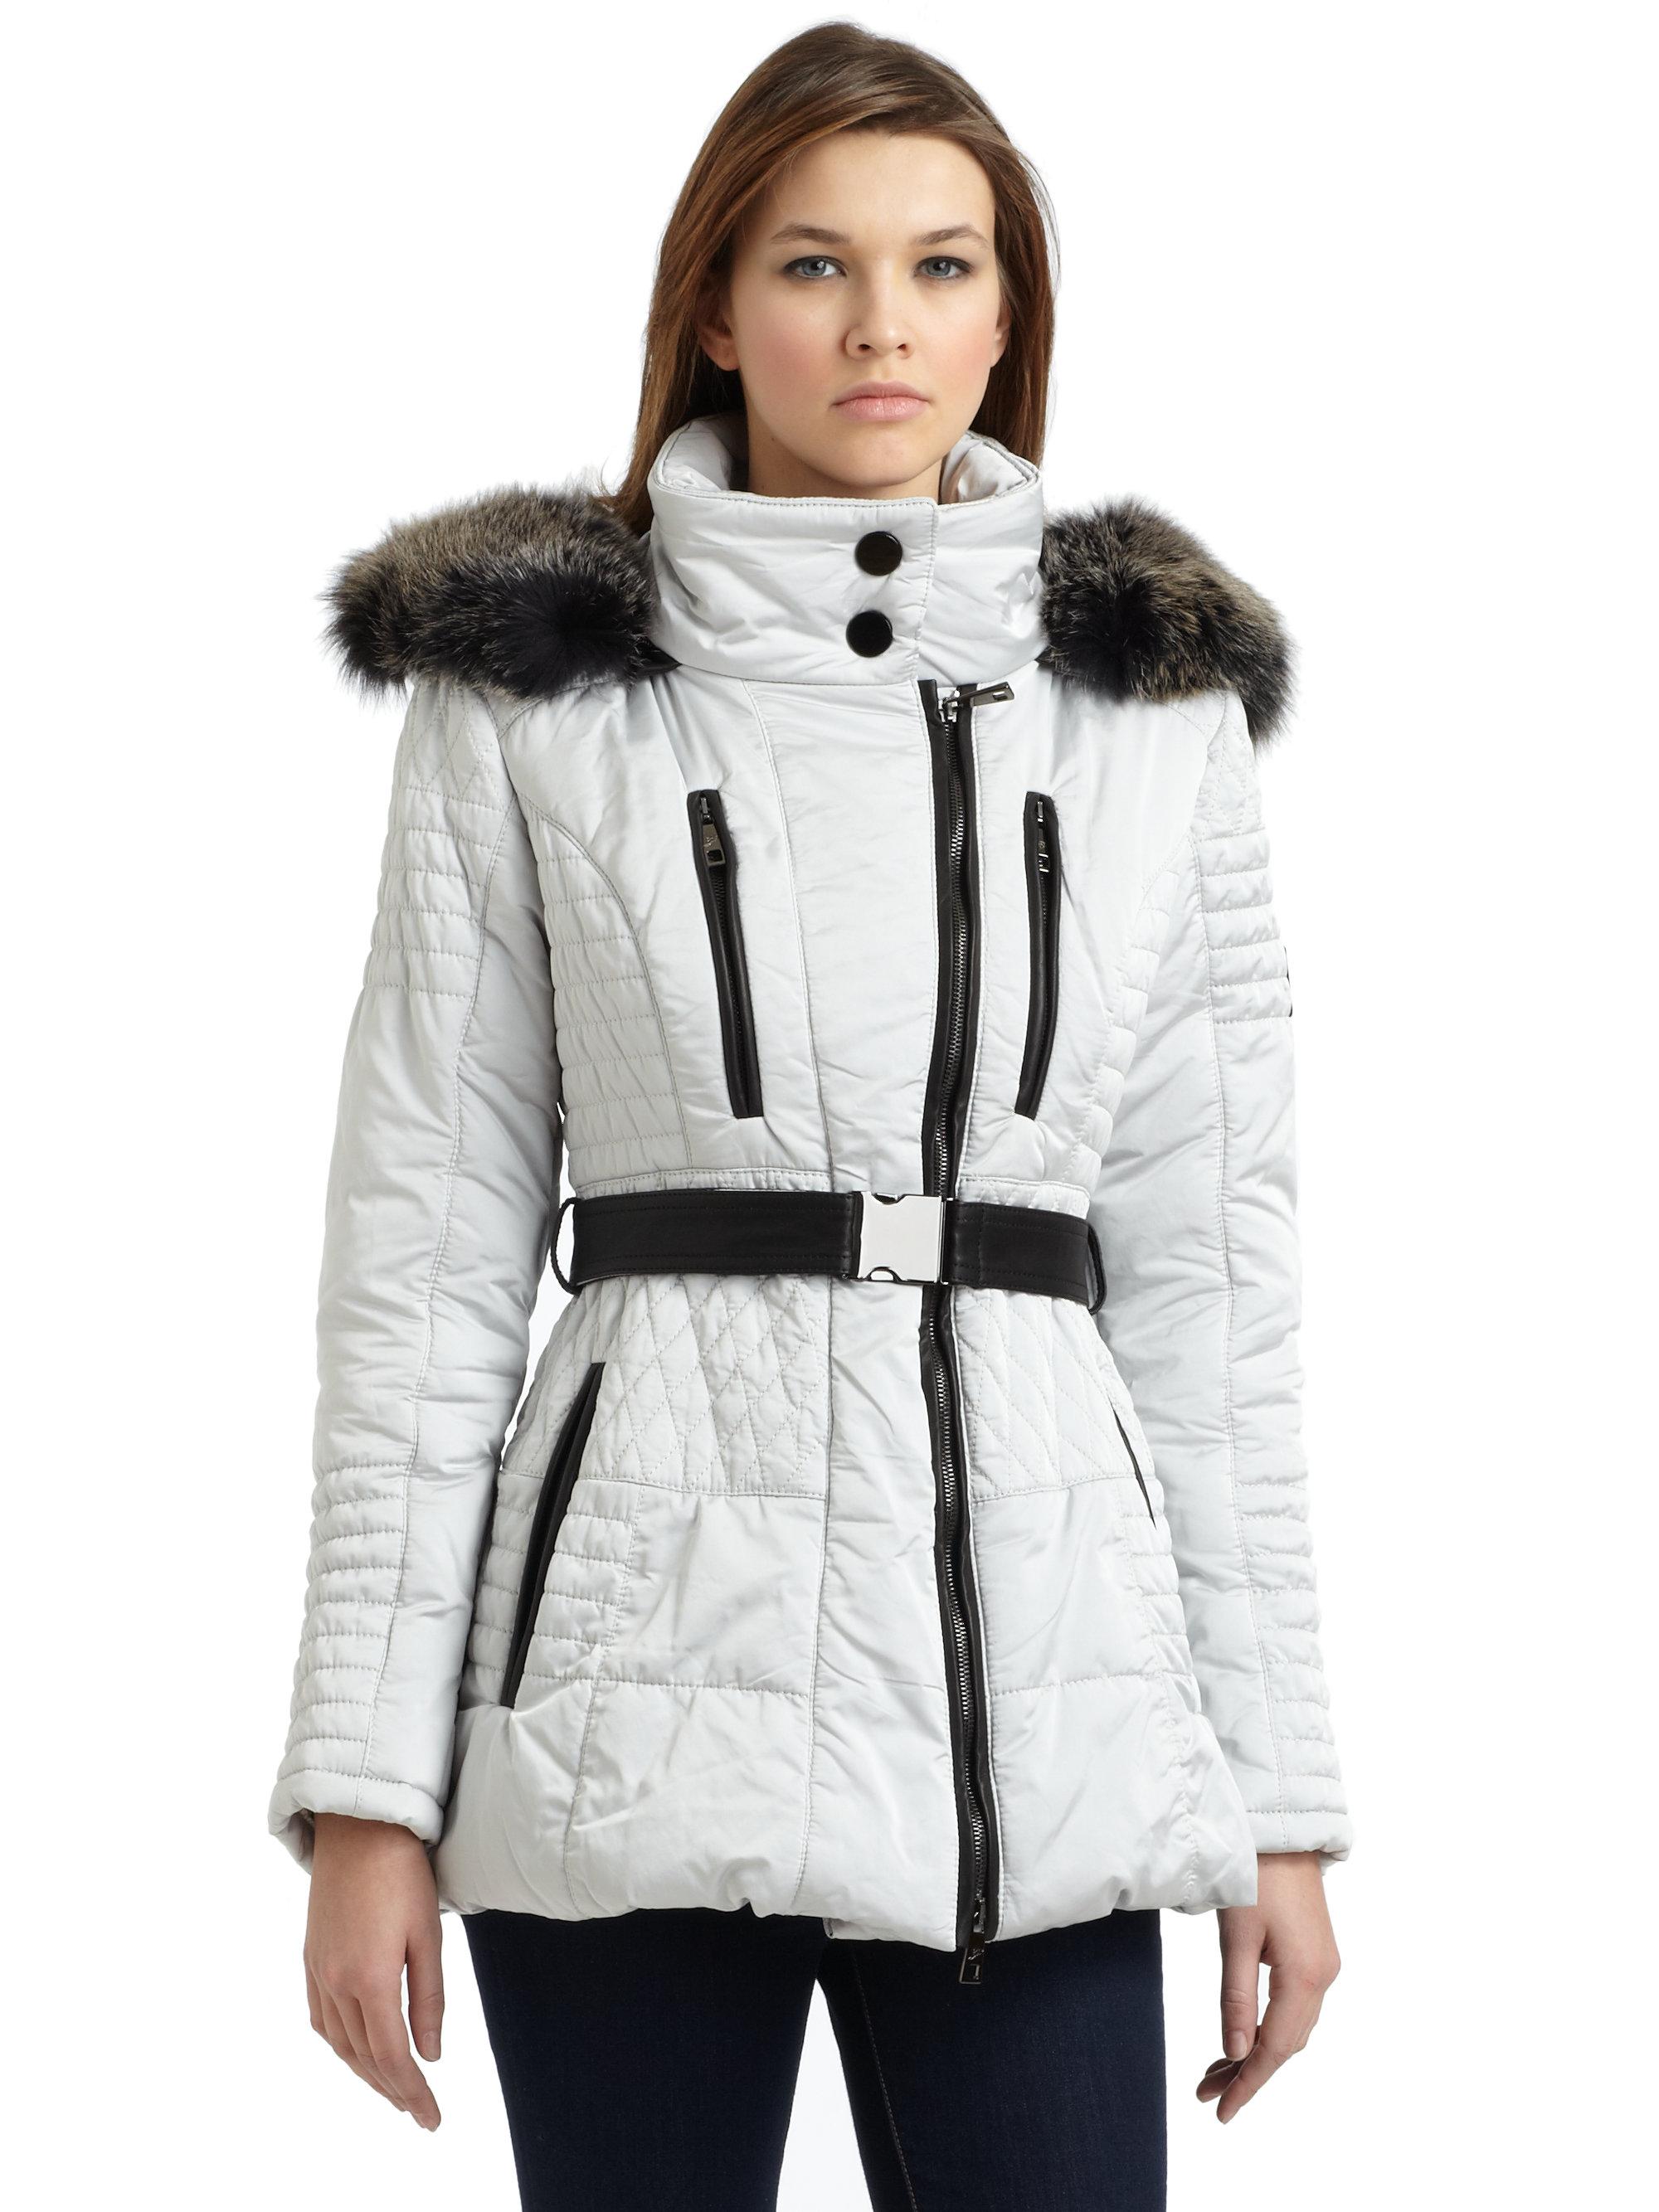 d12b5bdf10b Lyst - Gorski Argento Fur Trim Hood Quilted Ski Jacket in White